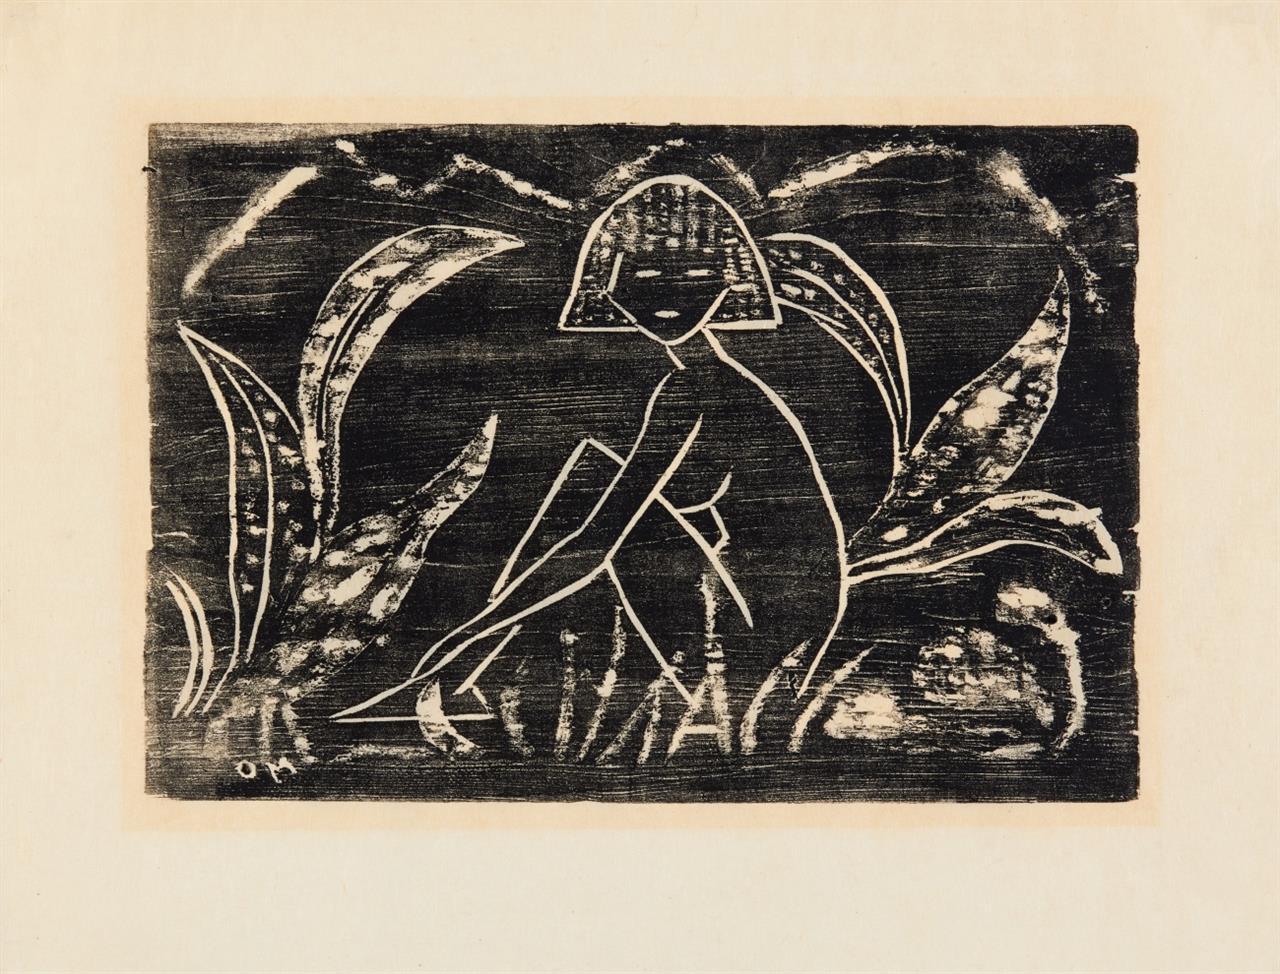 Otto Mueller. Mädchen zwischen Blattpflanzen. 1912 (1945/1952). Posthumer Abzug.  Karsch 3 II A.